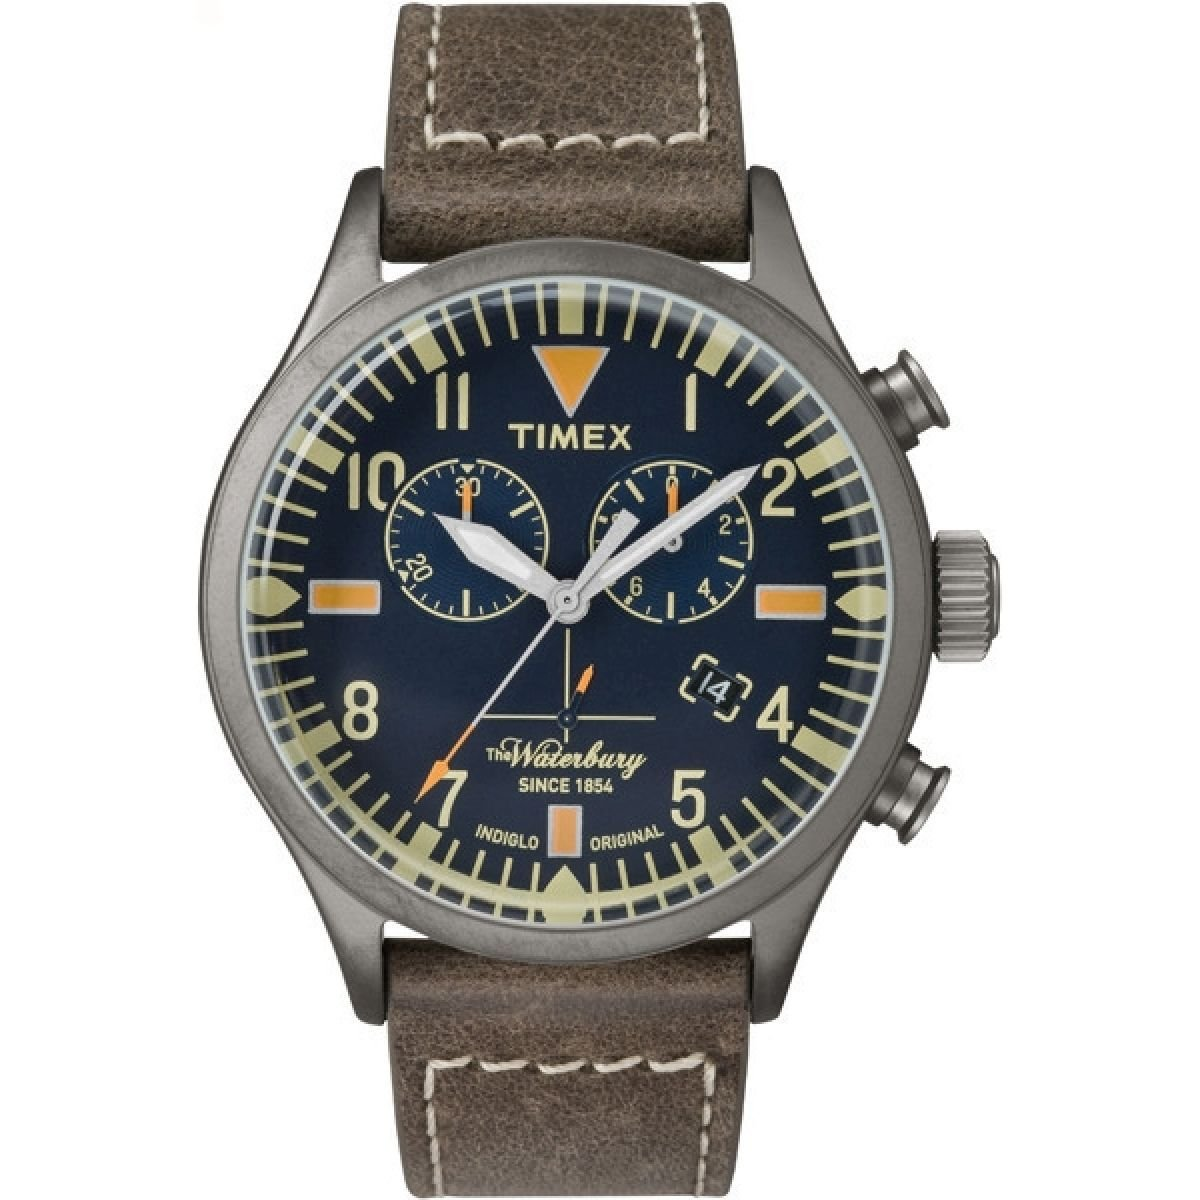 Timex Originals TW2P84100 Mens Waterbury Brown Leather Strap Chronograph Watch